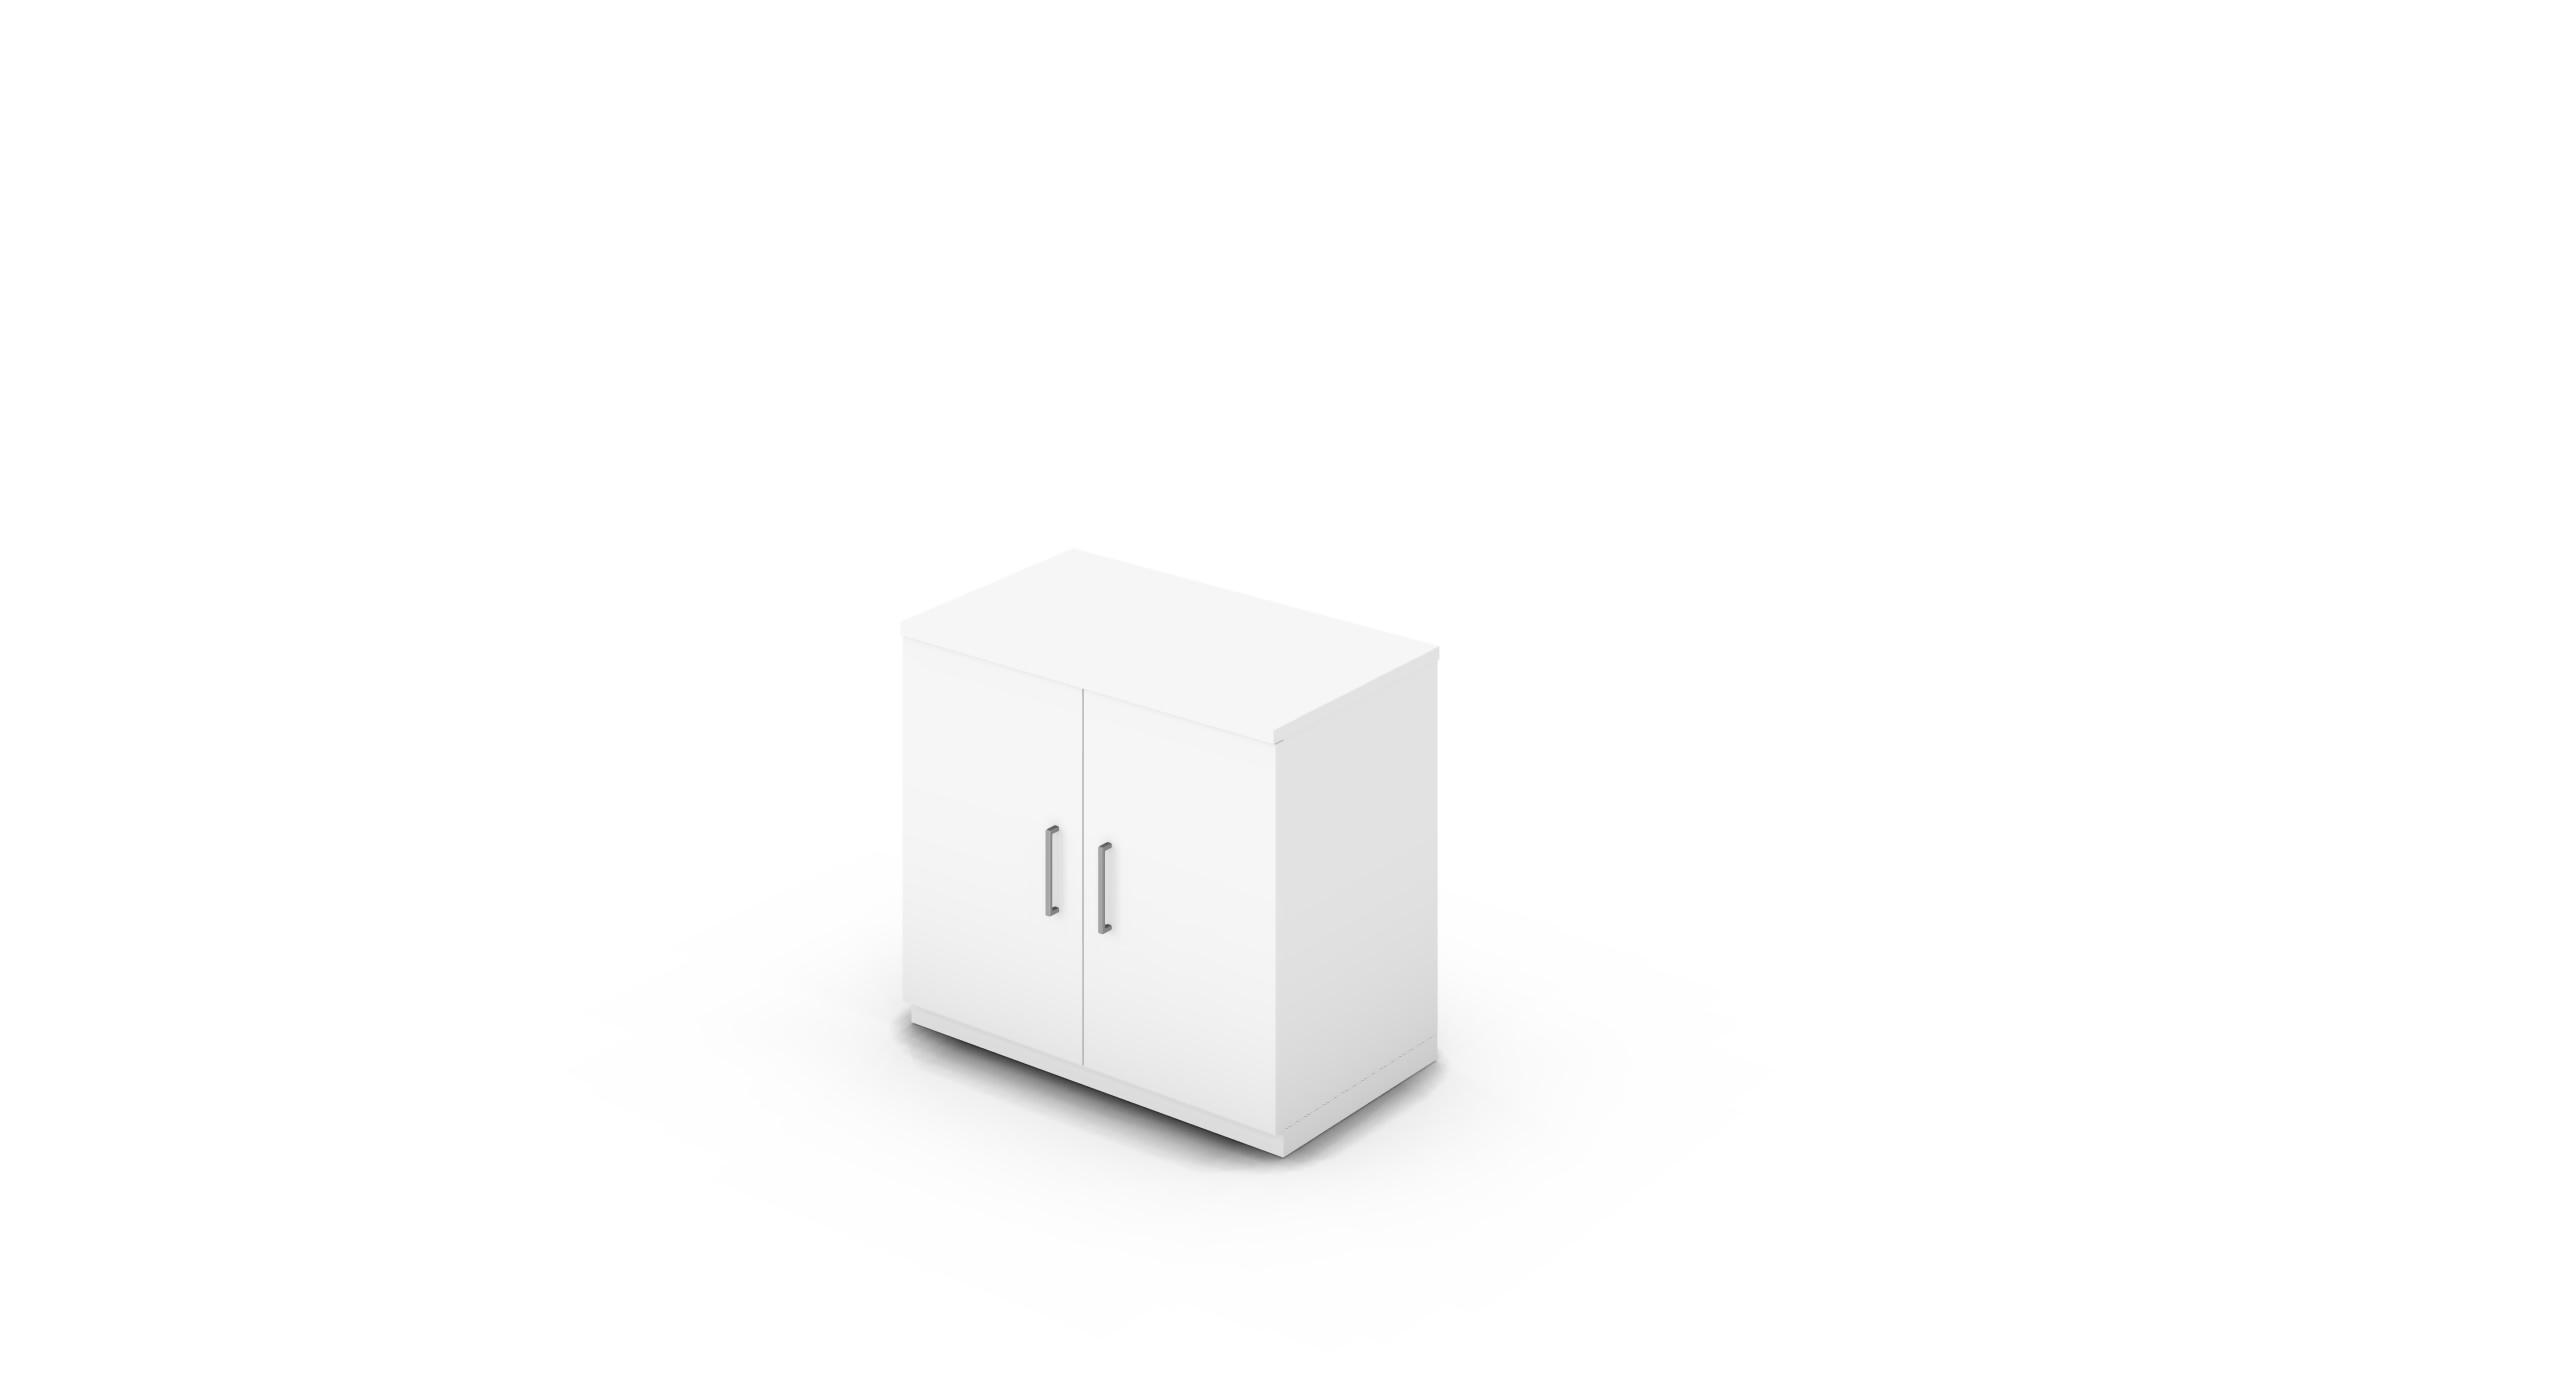 Cabinet_800x450x775_HD_White_Bar_Square_NoCylinder